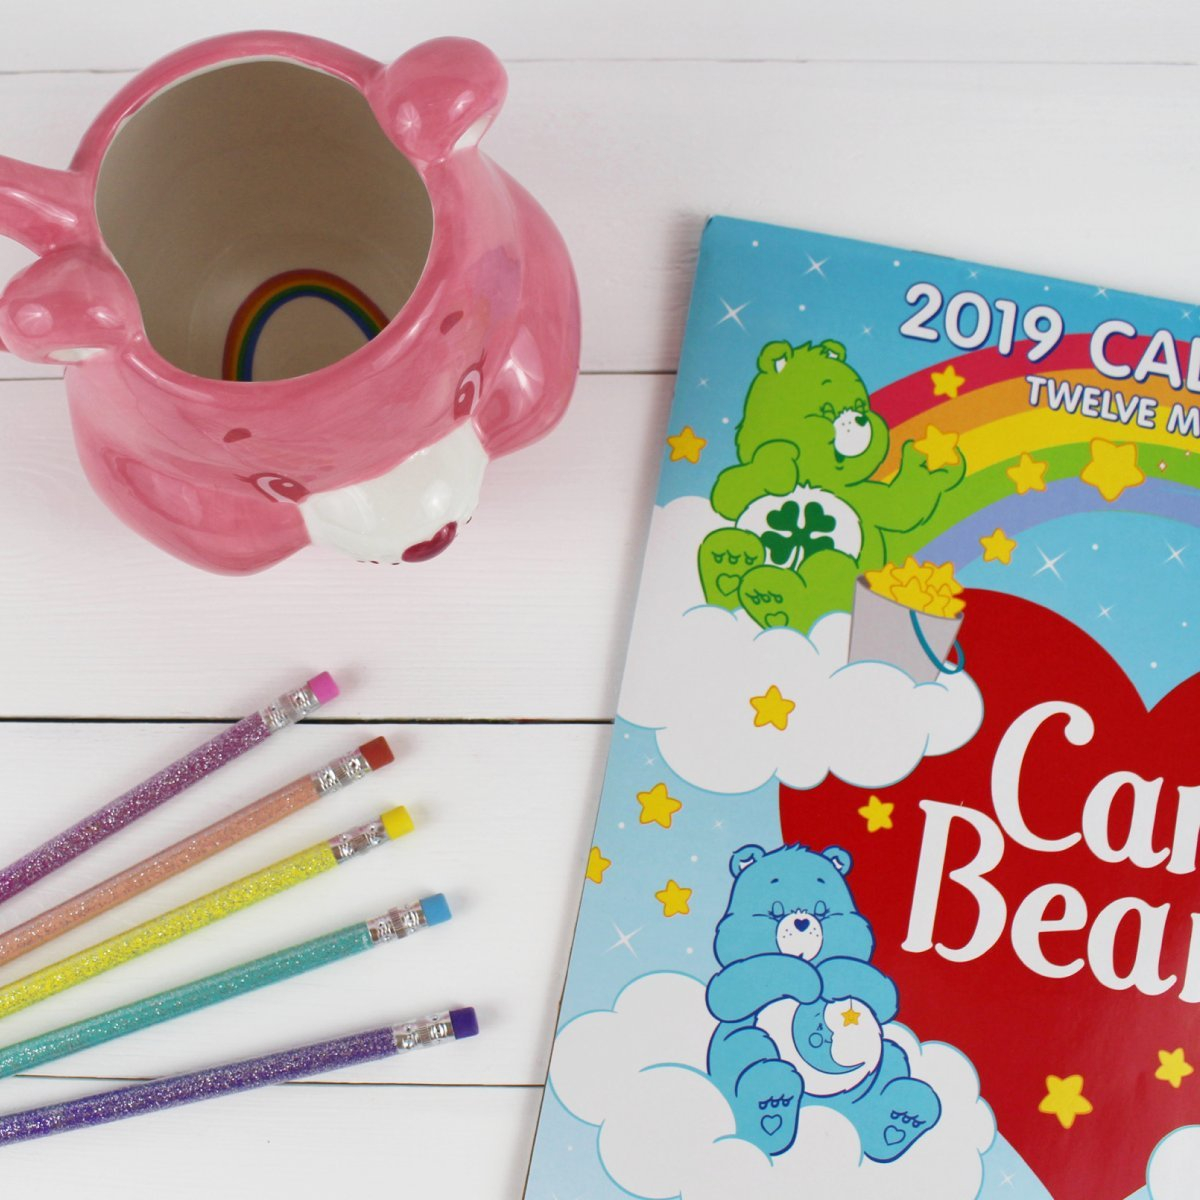 "Care Bears™ On Twitter: ""a #retro Calendar To Help You Get Organized Calendar 2019 Dollar Tree"